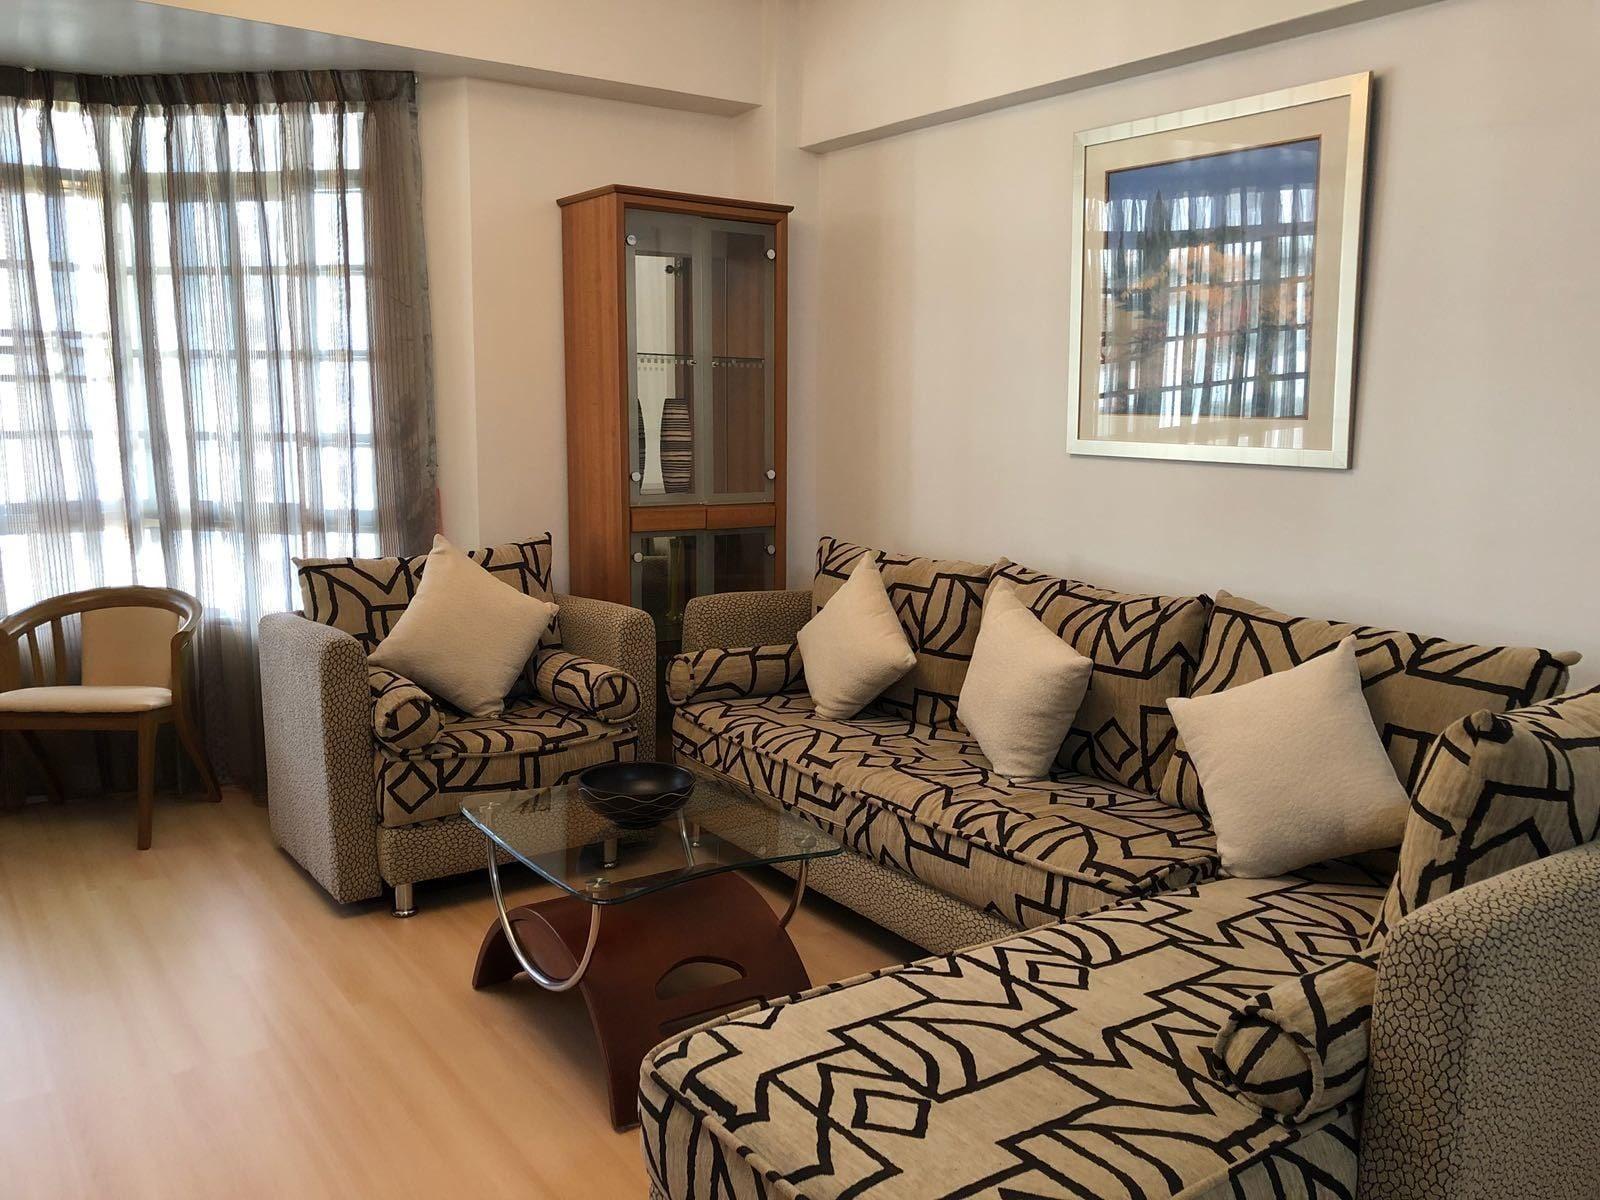 4Pax Mawar Apartments Genting Highlands, Bentong